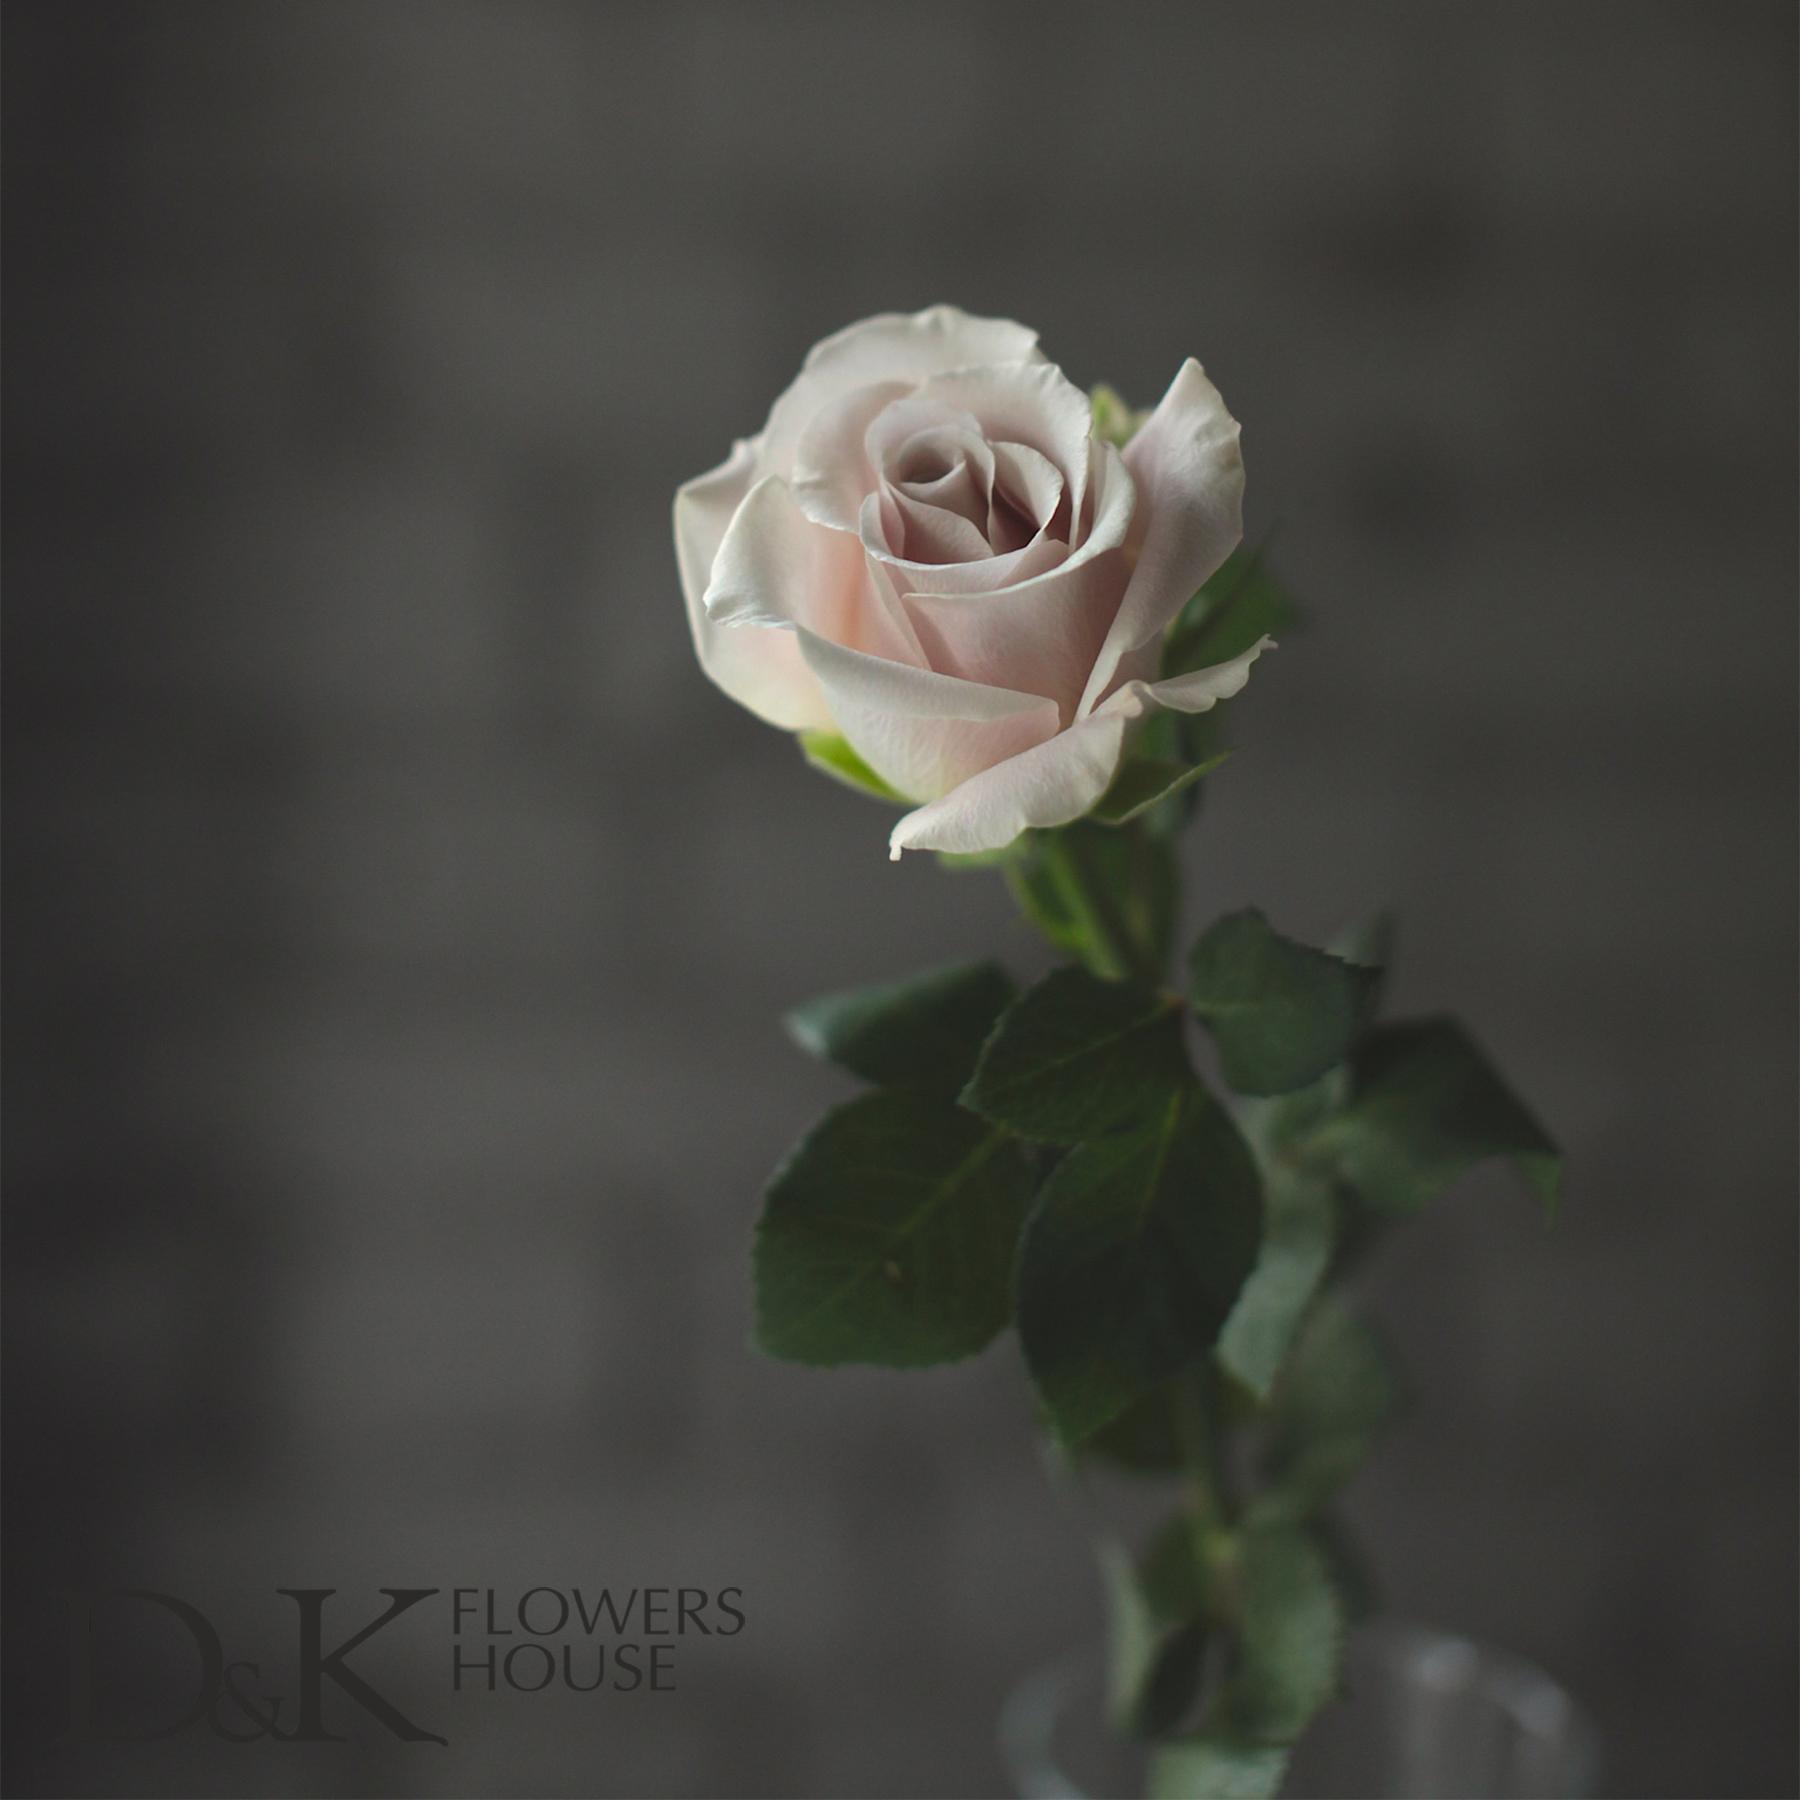 Цветы D&K Flowers House: Роза Juliet от David Austin